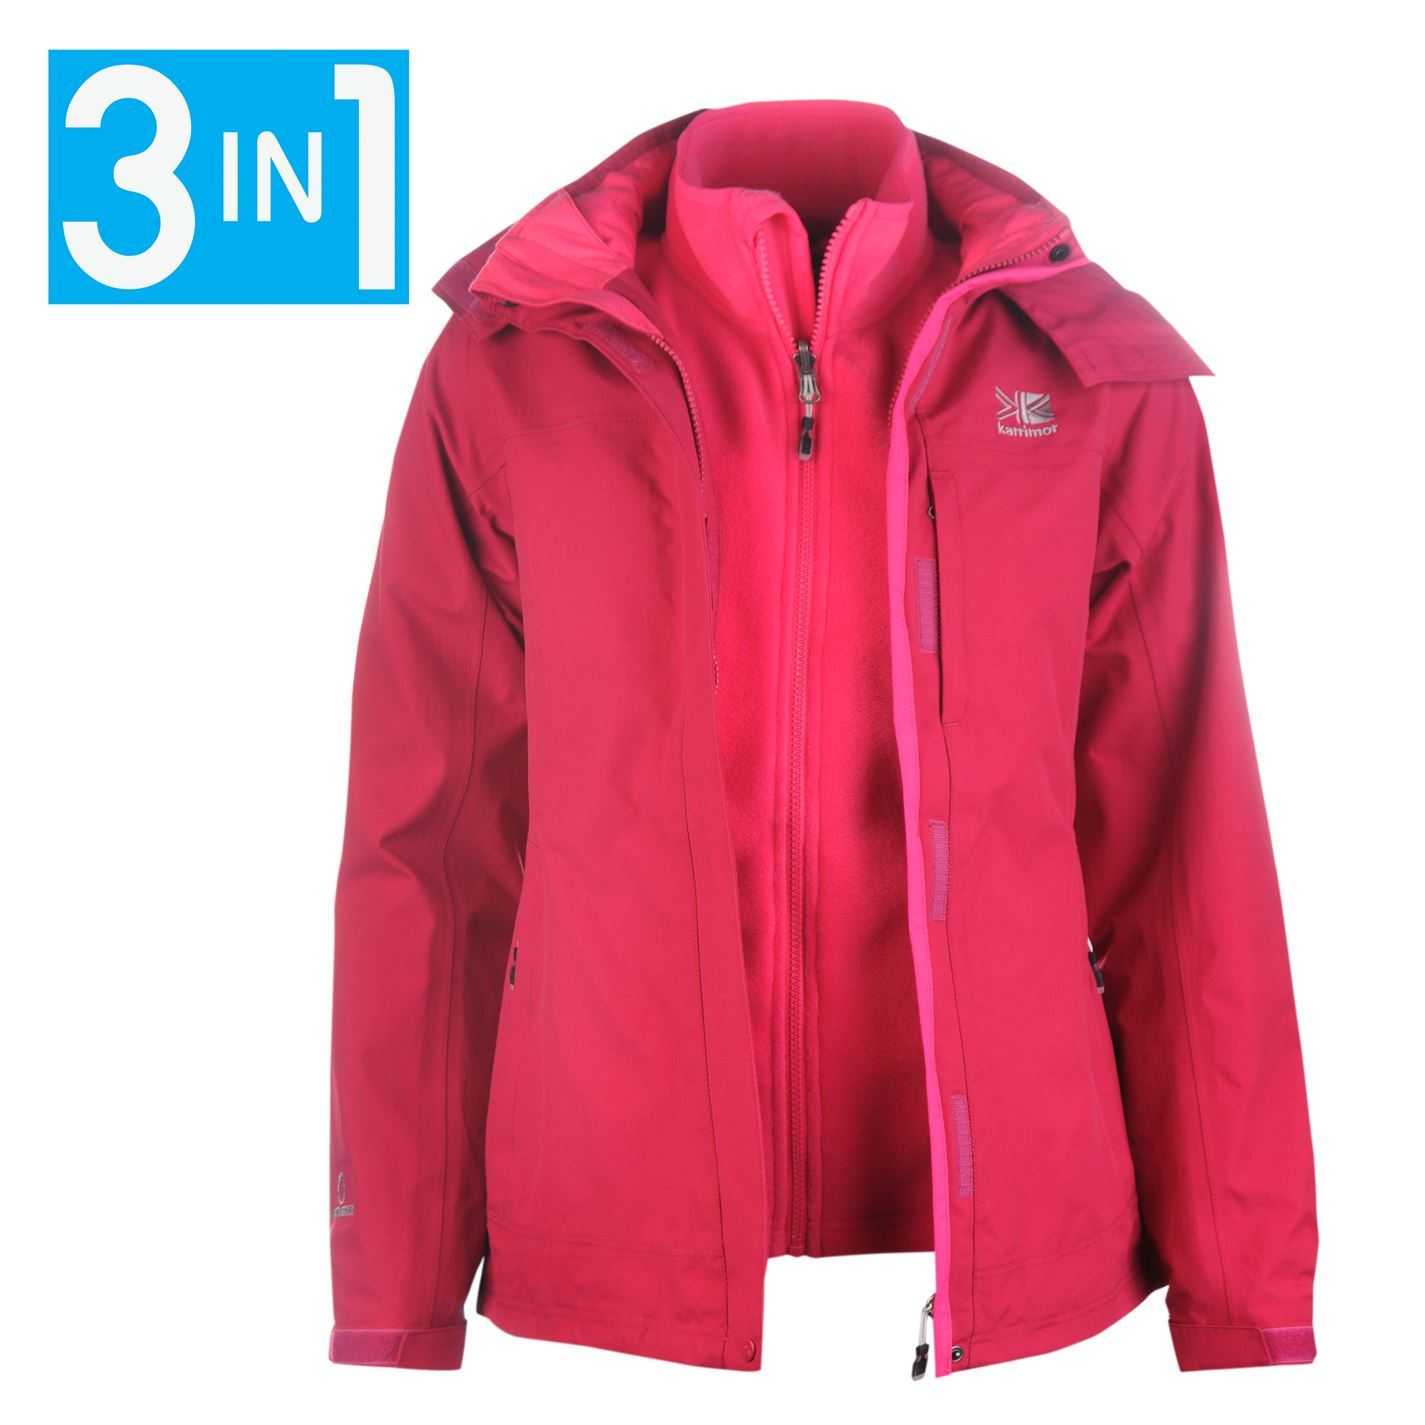 Womens sport coat